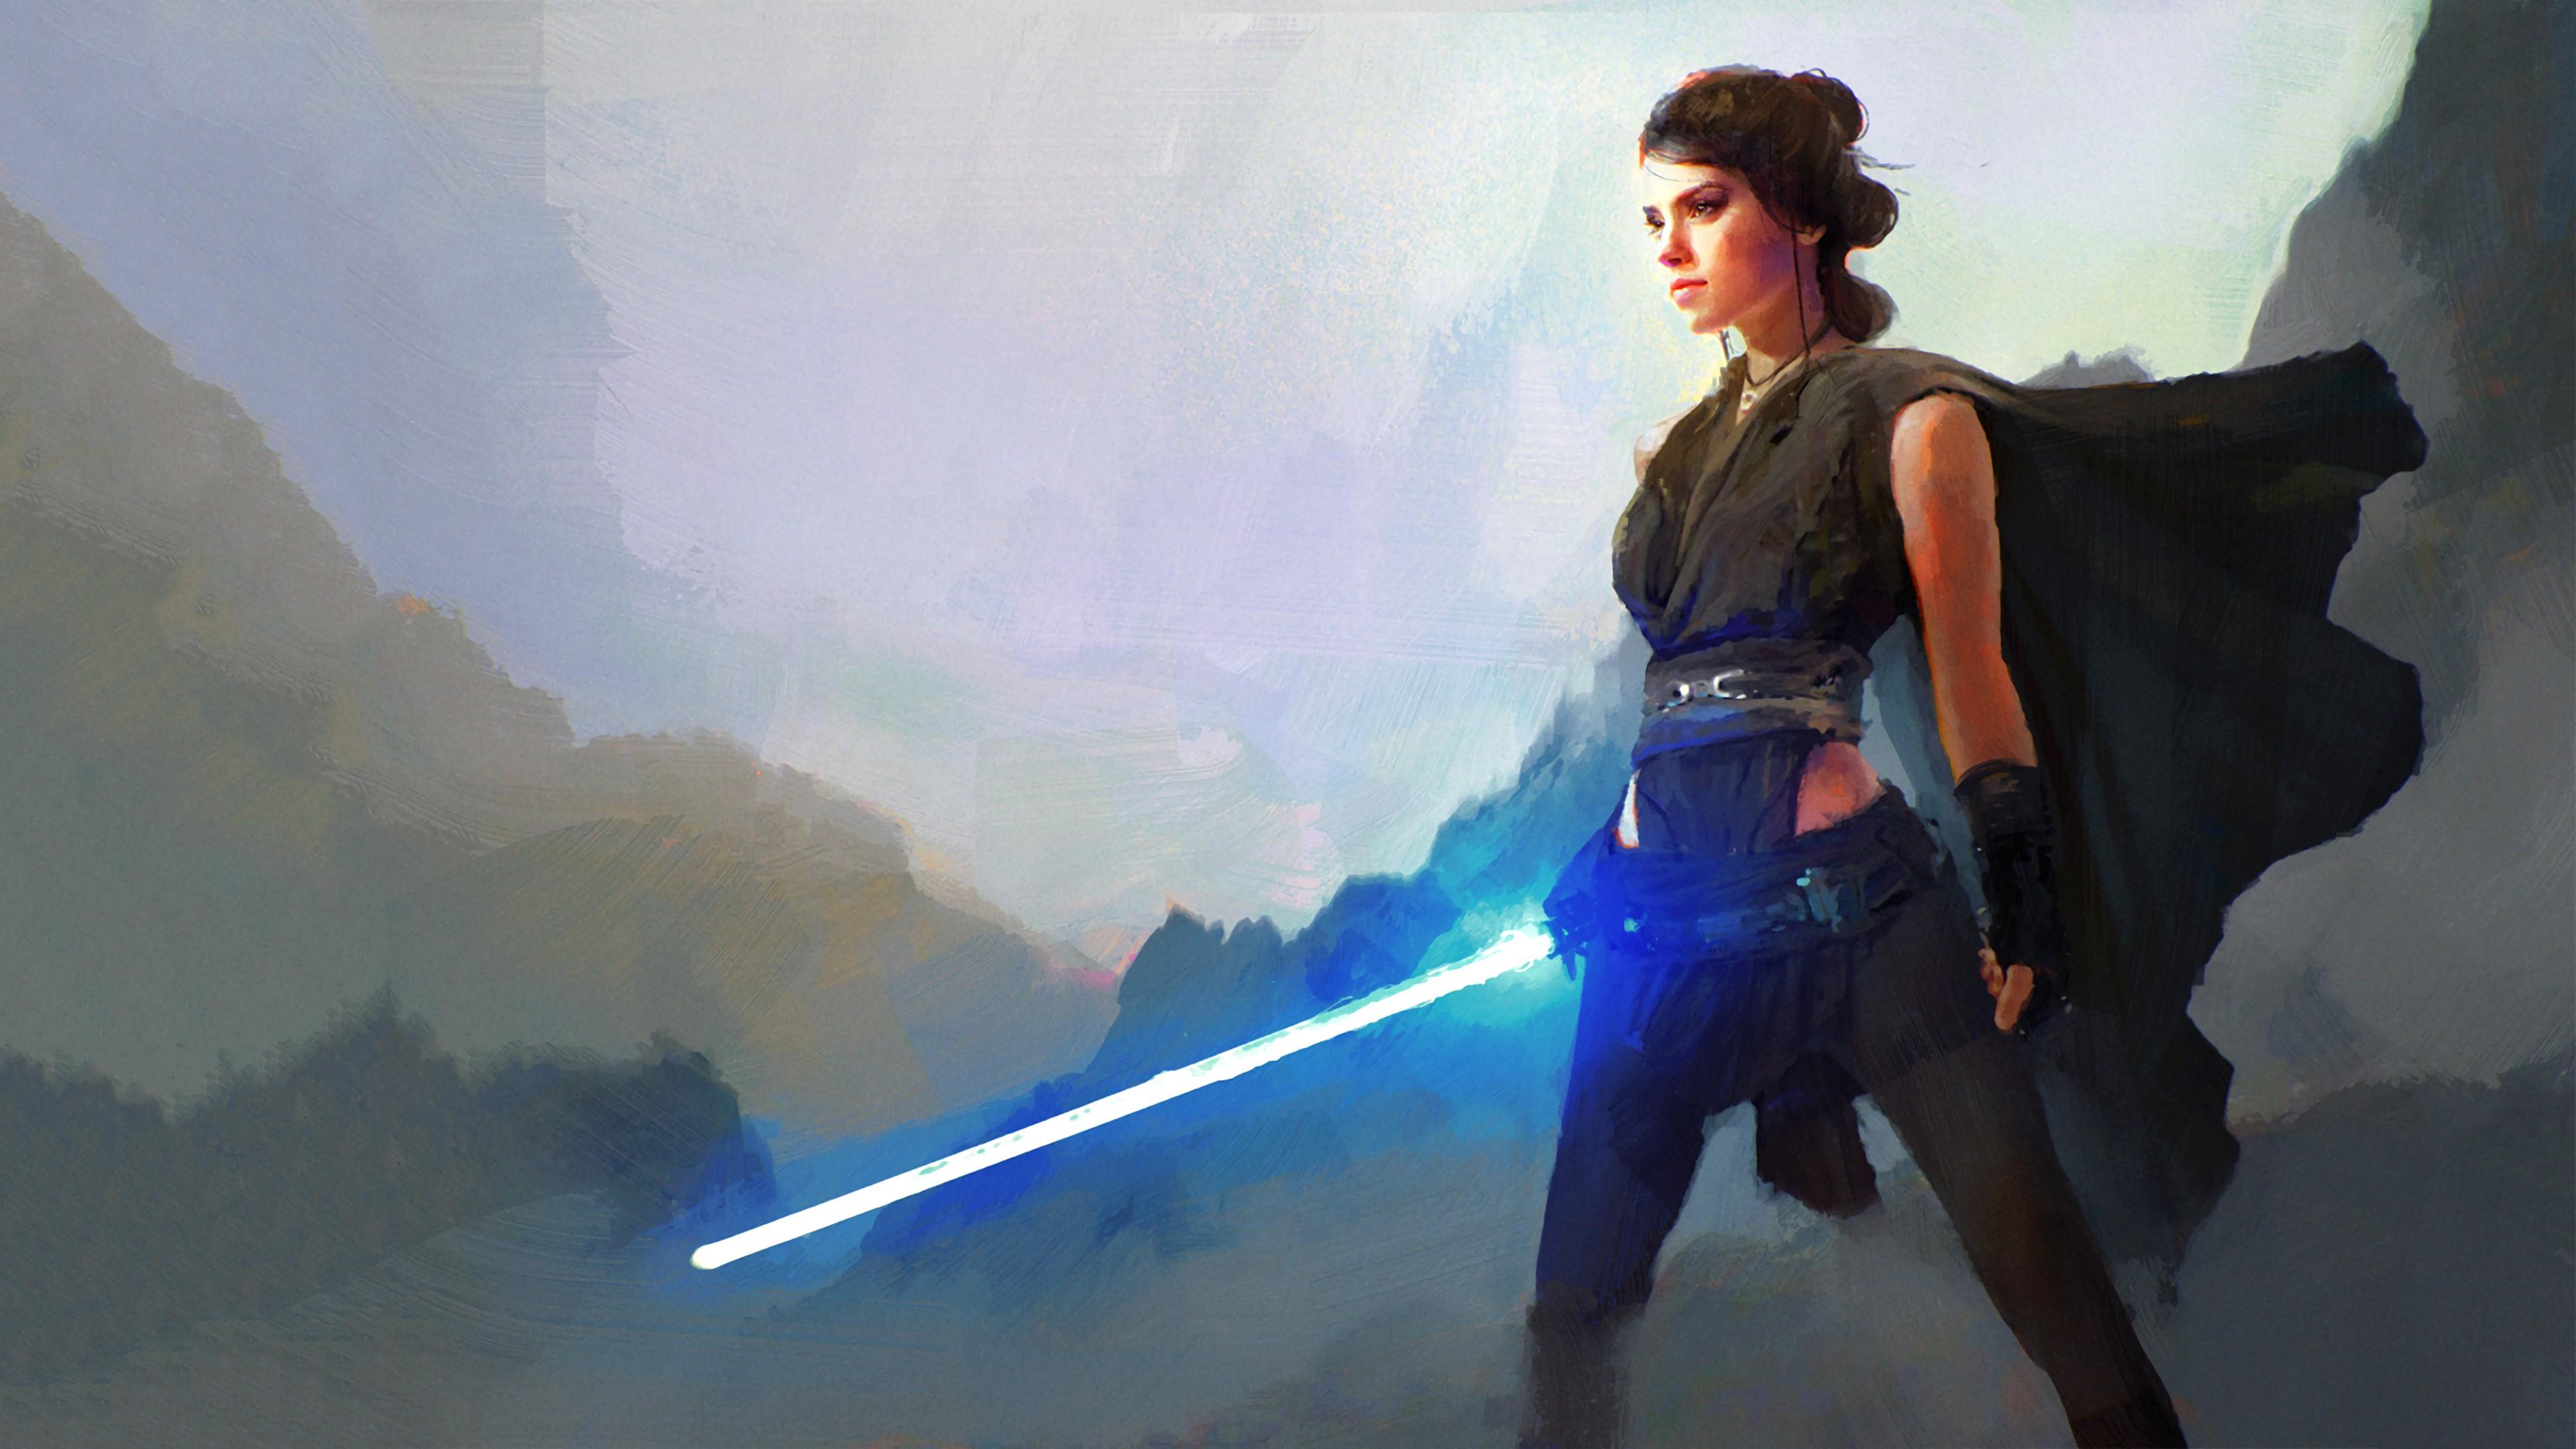 Wallpaper Star Wars Rey From Star Wars Star Wars The